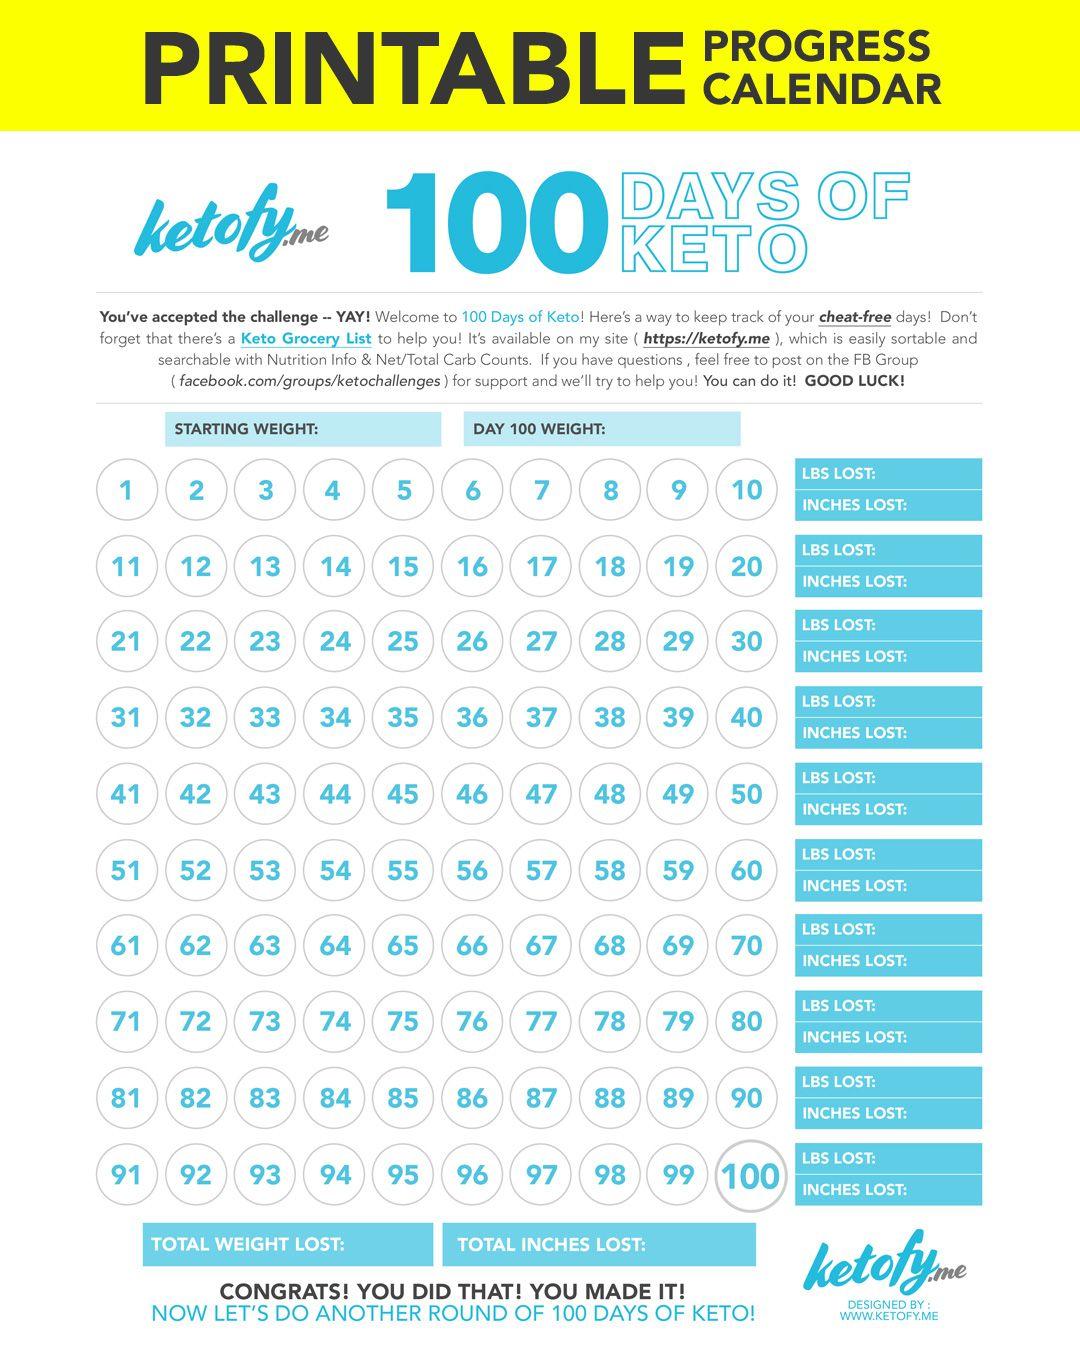 Ketofy.me 100 Days of Keto - Print - Printable Progress Calendar | Workin on ma fitness in 2019 ...